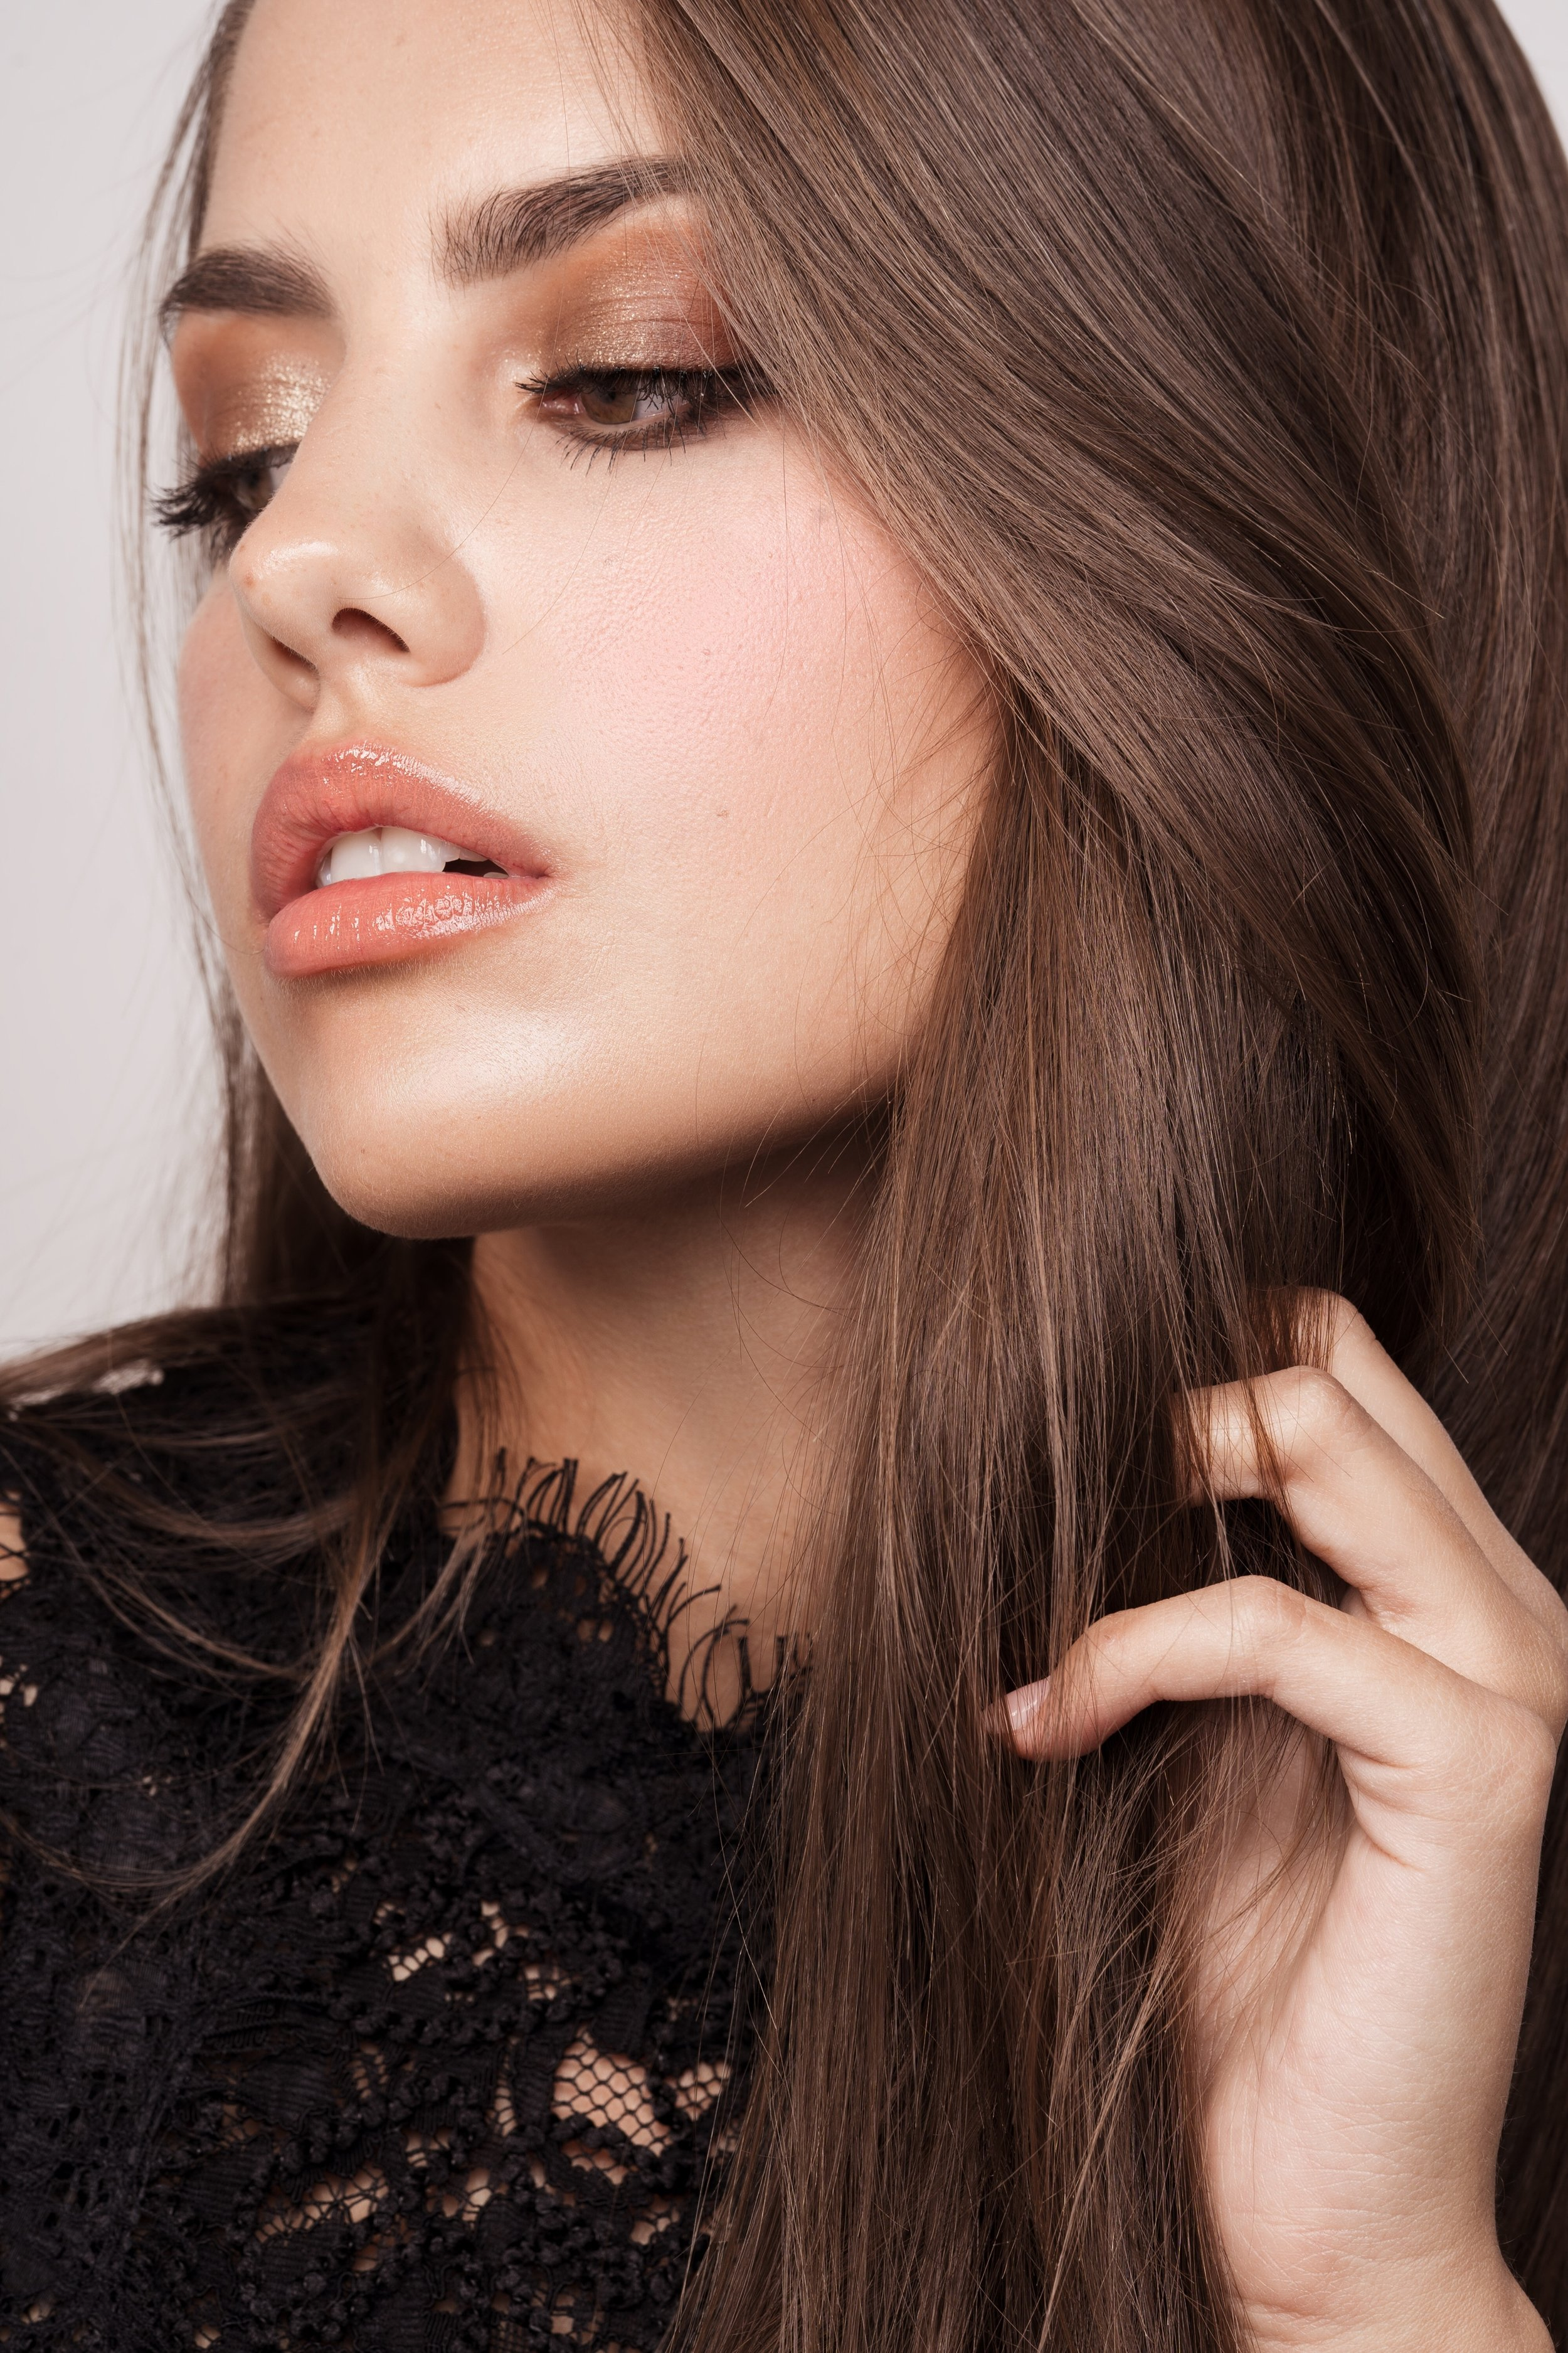 Photo: Wild und Wunderbar/Model: Simone Haas